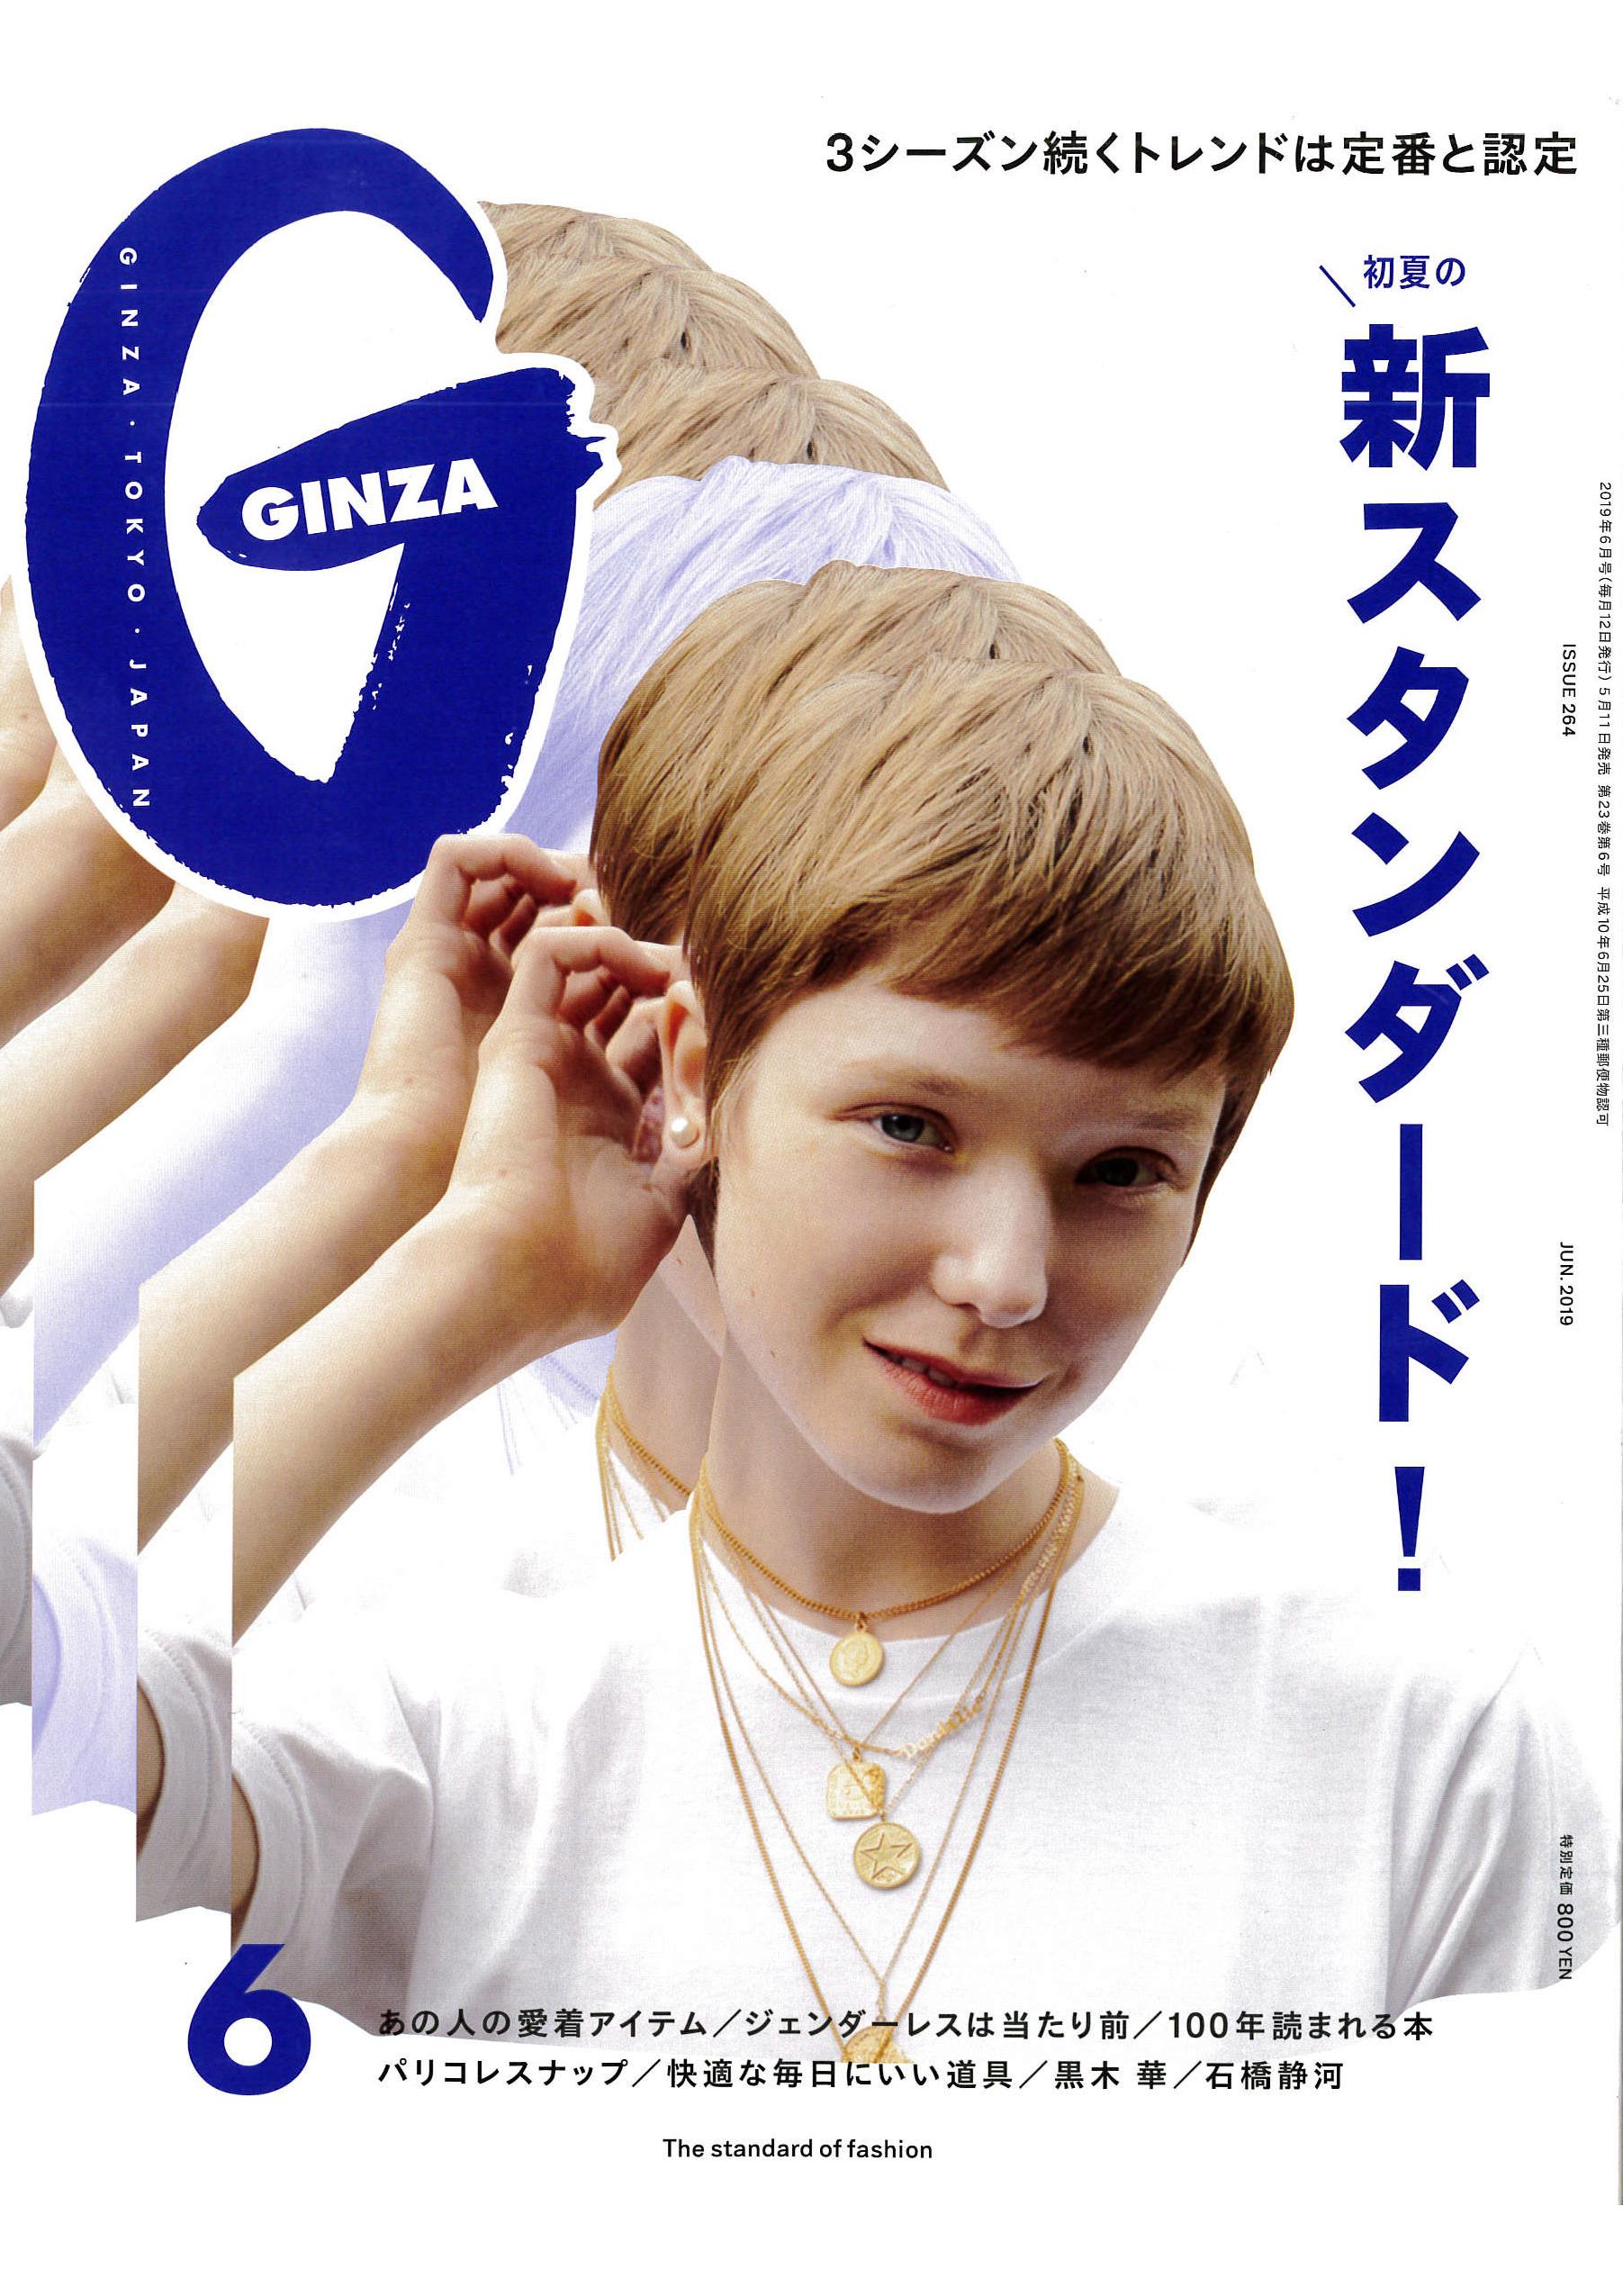 GINZA(ギンザ)6月号